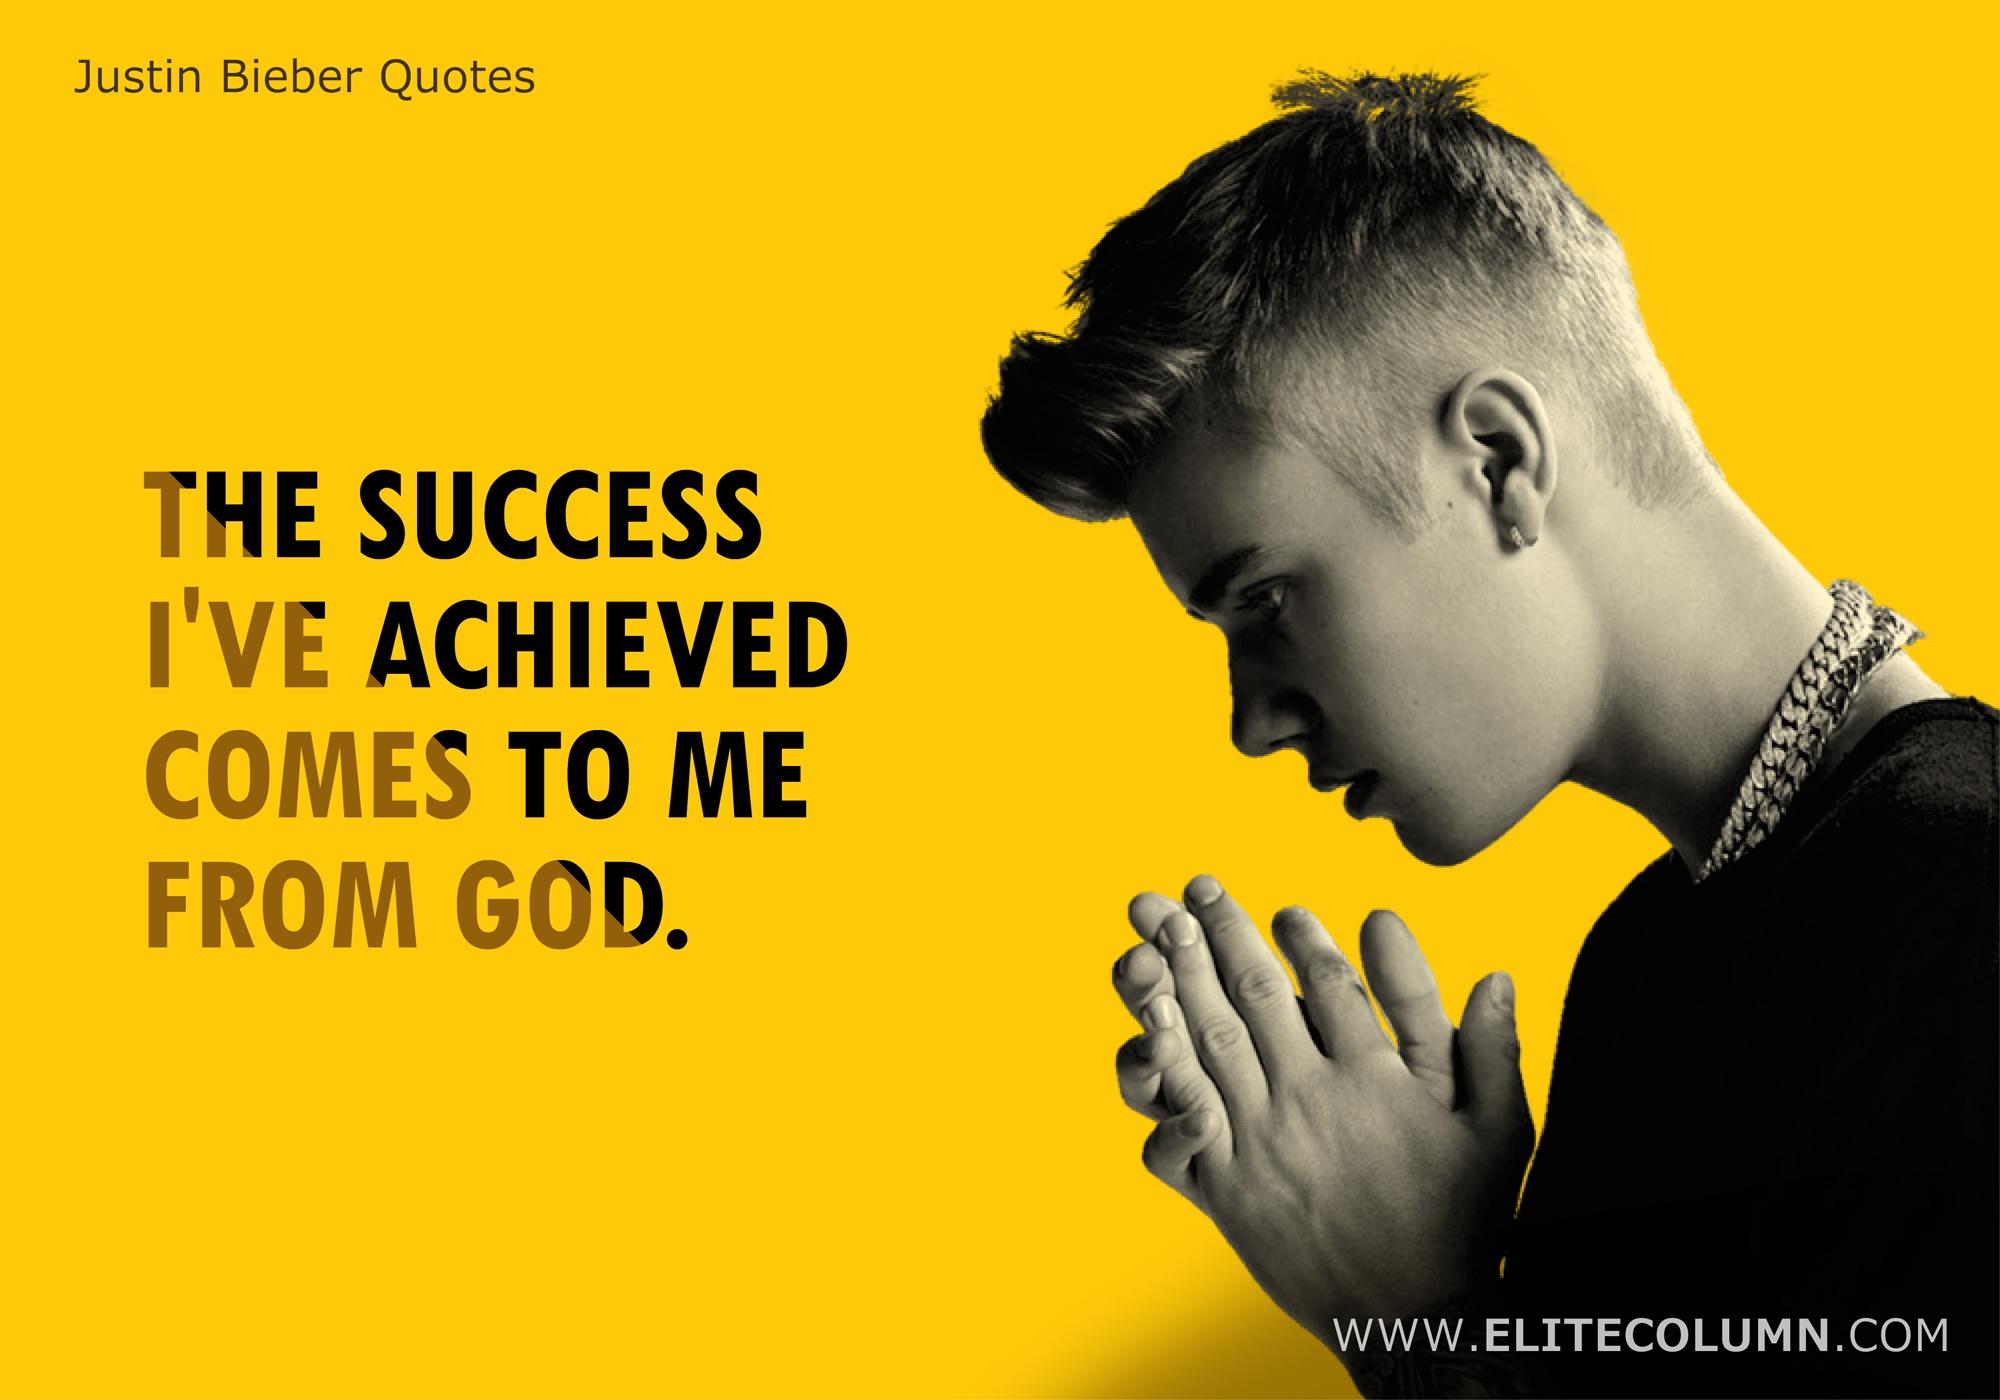 Justin Bieber Quotes (7)